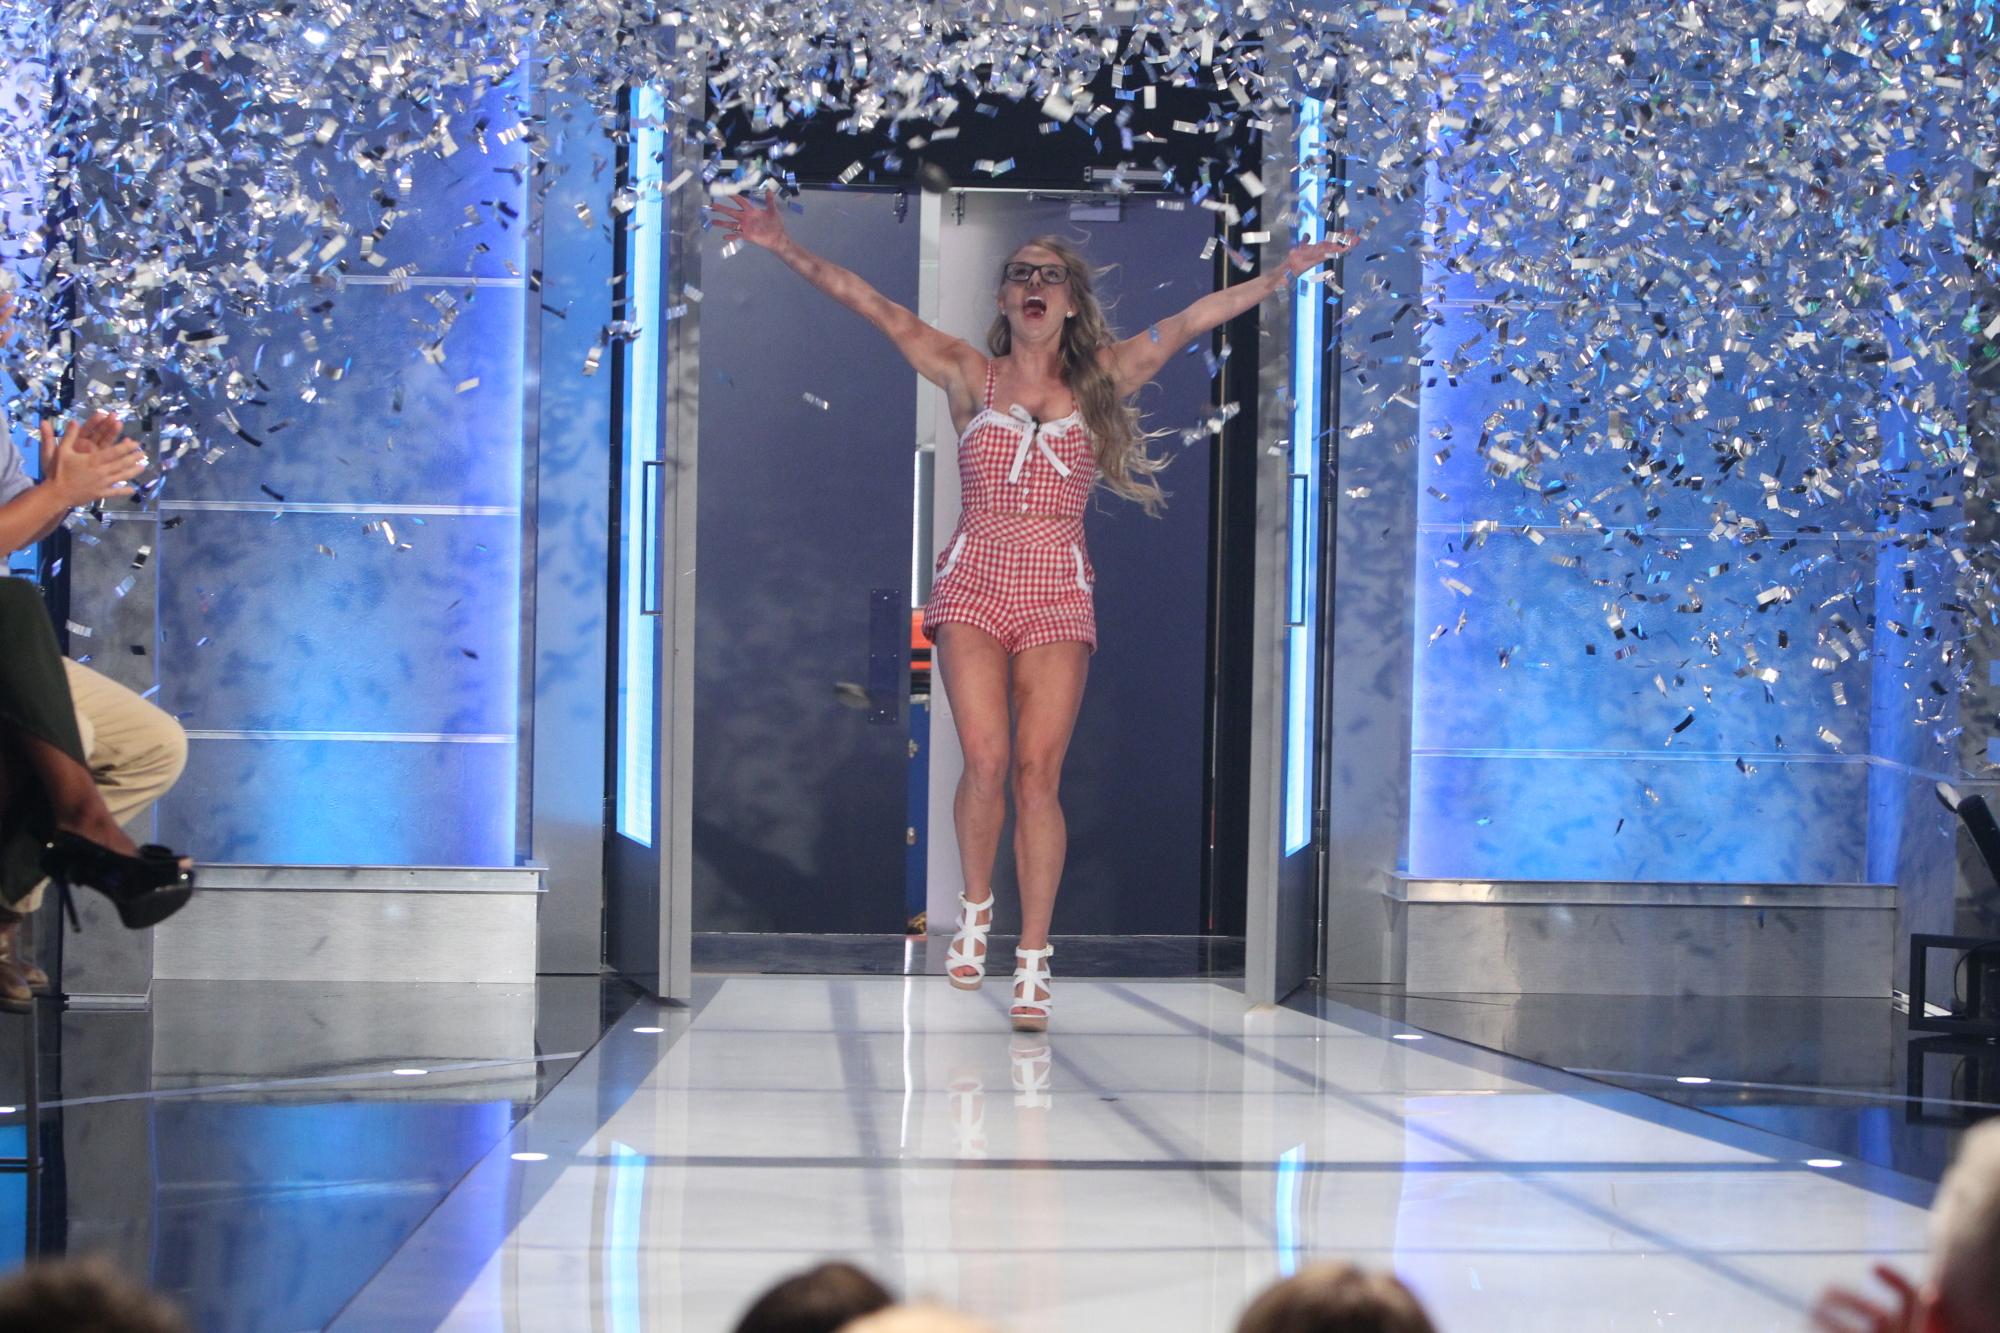 Nicole Franzel is the winner on the Big Brother season 18